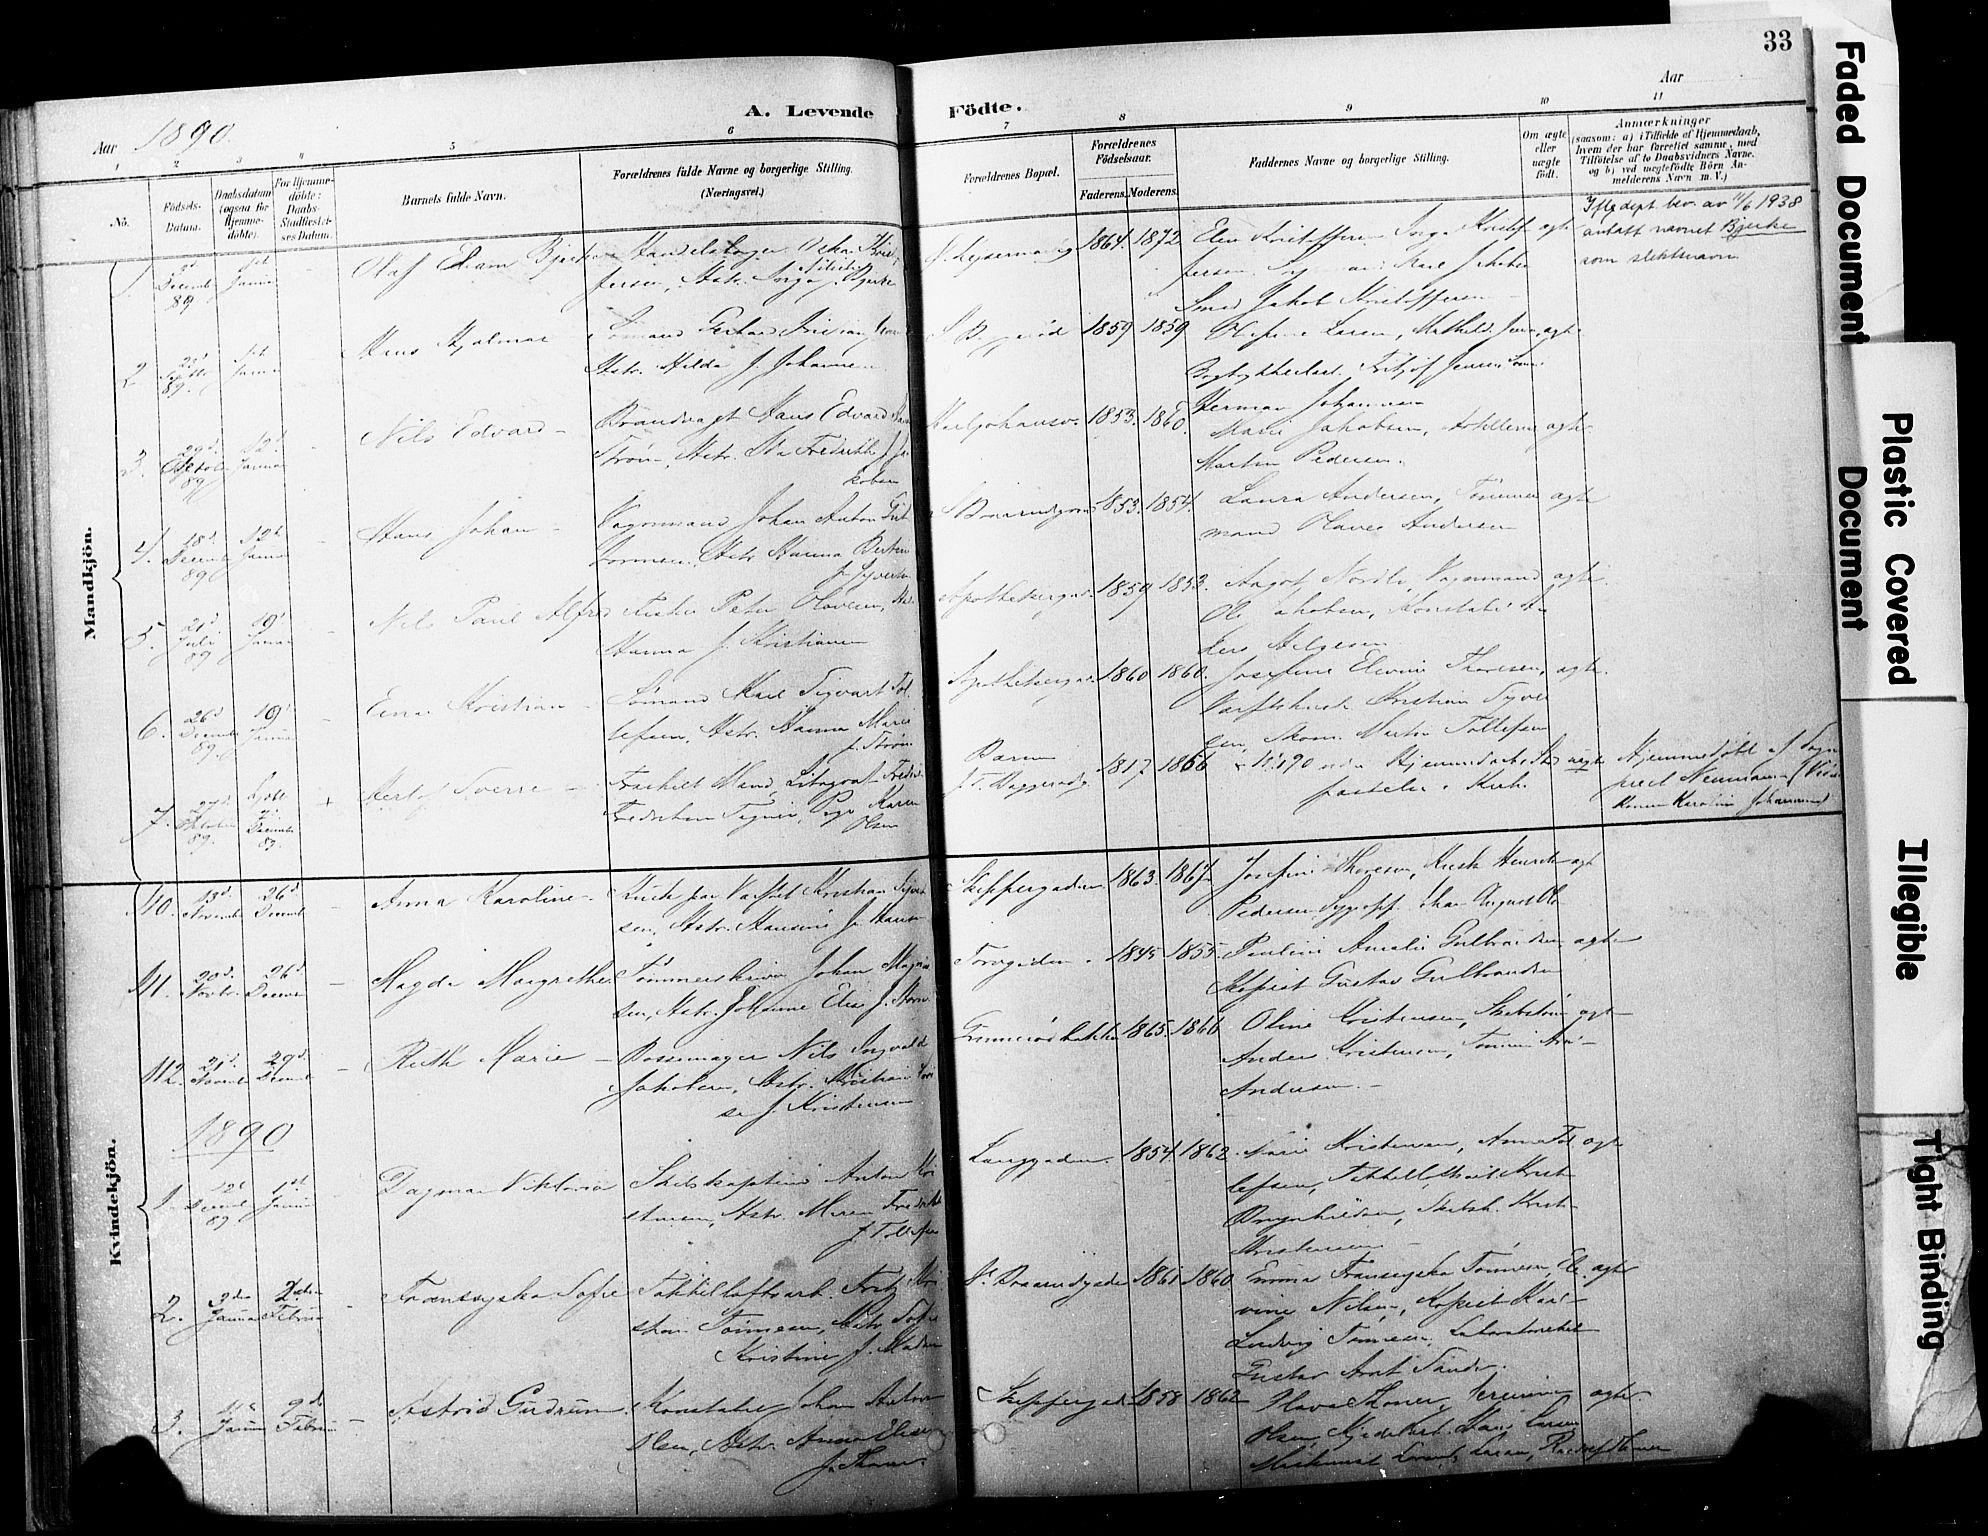 SAKO, Horten kirkebøker, F/Fa/L0004: Parish register (official) no. 4, 1888-1895, p. 33